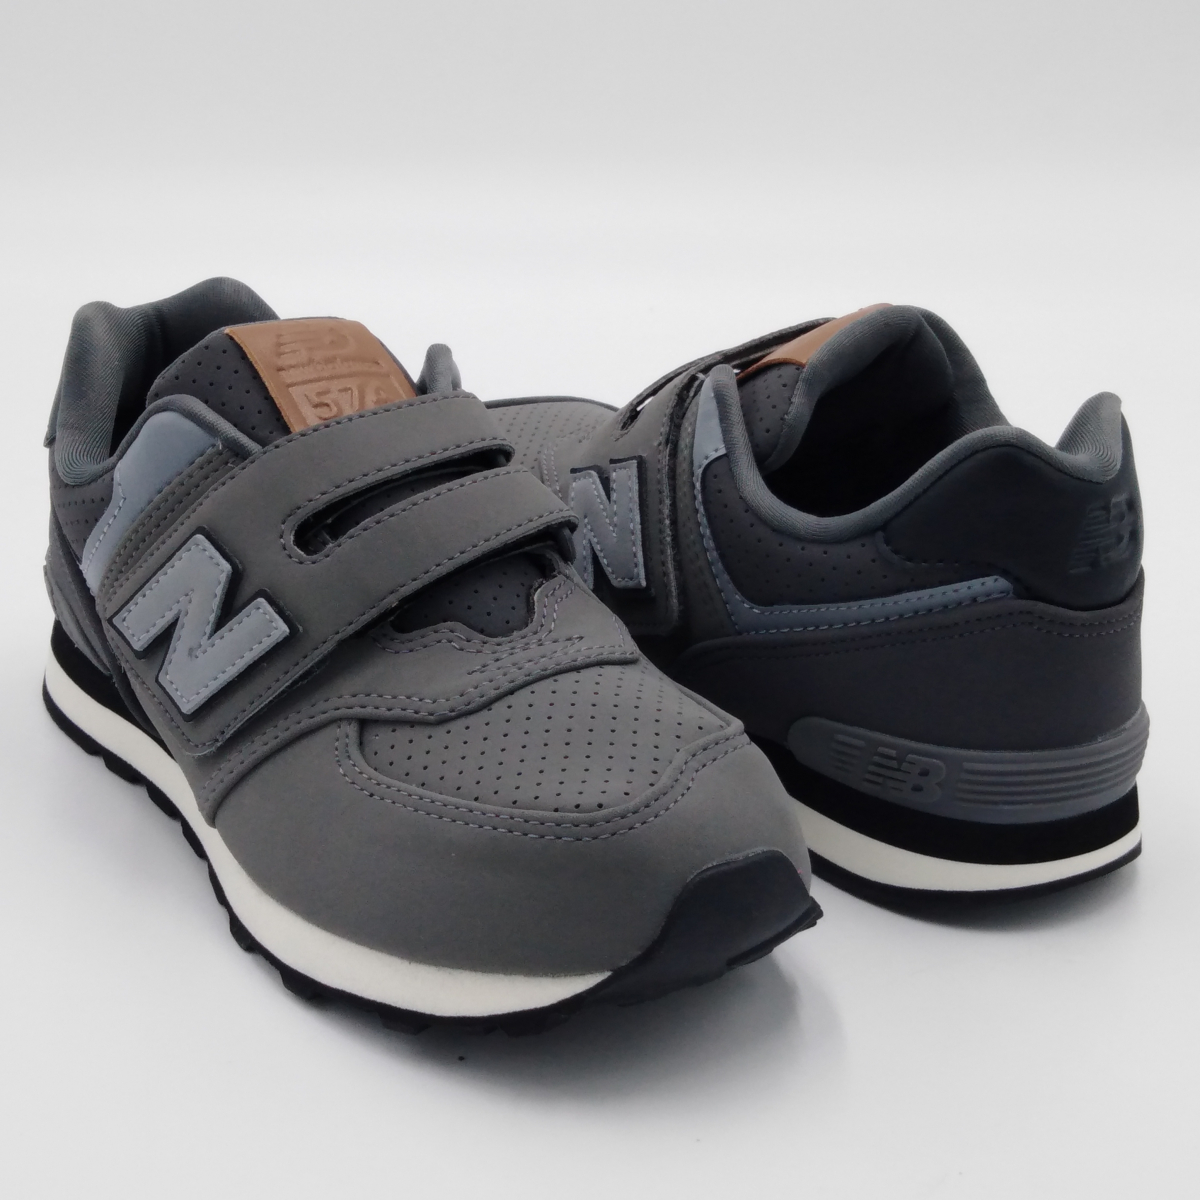 new balance 574 bambino grigio